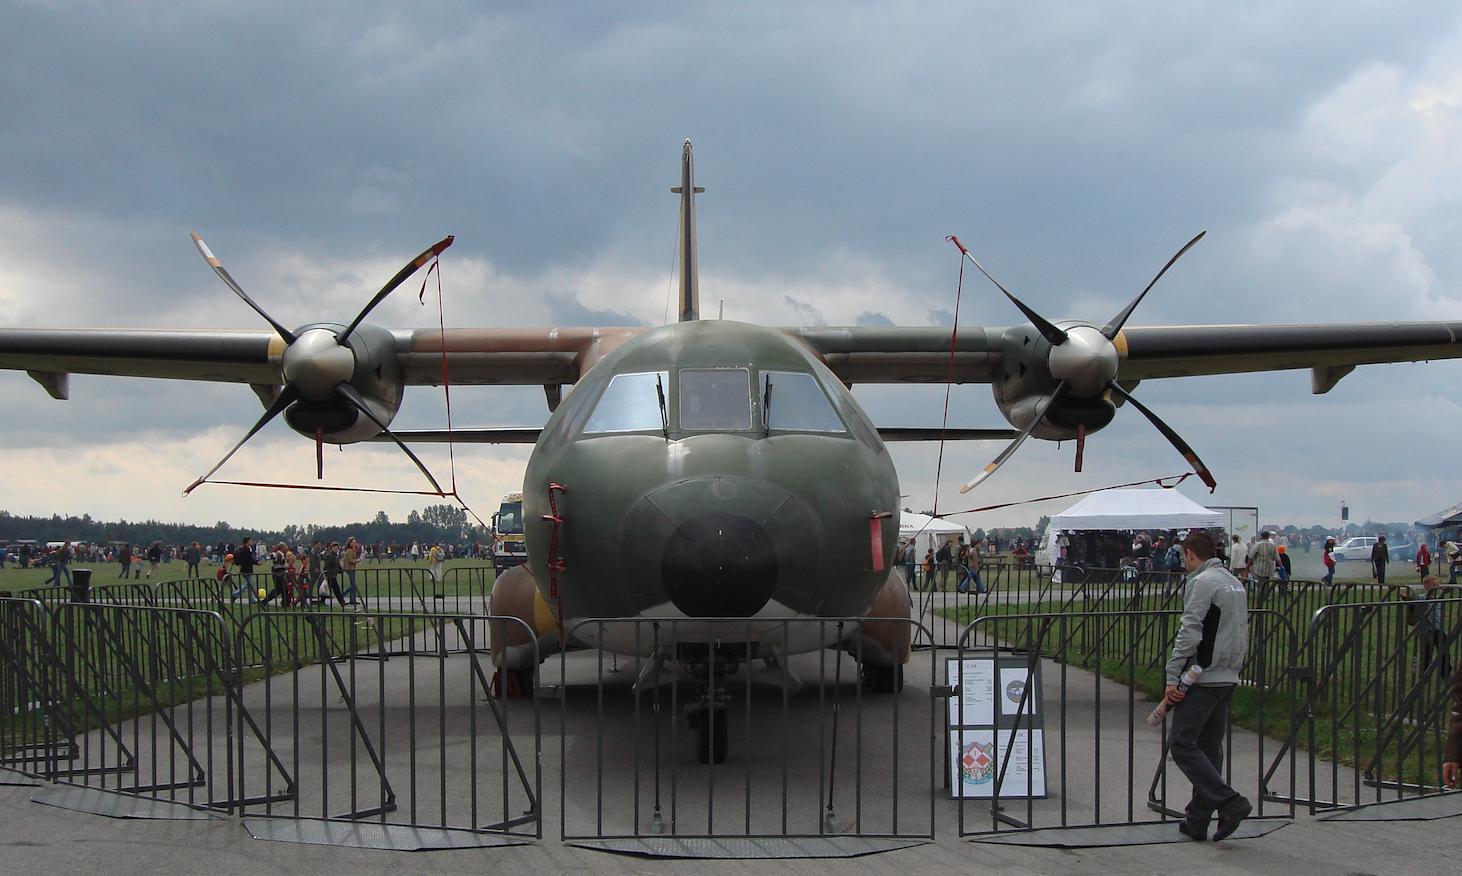 CASA C-235. 2007 rok. Zdjęcie Karol Placha Hetman